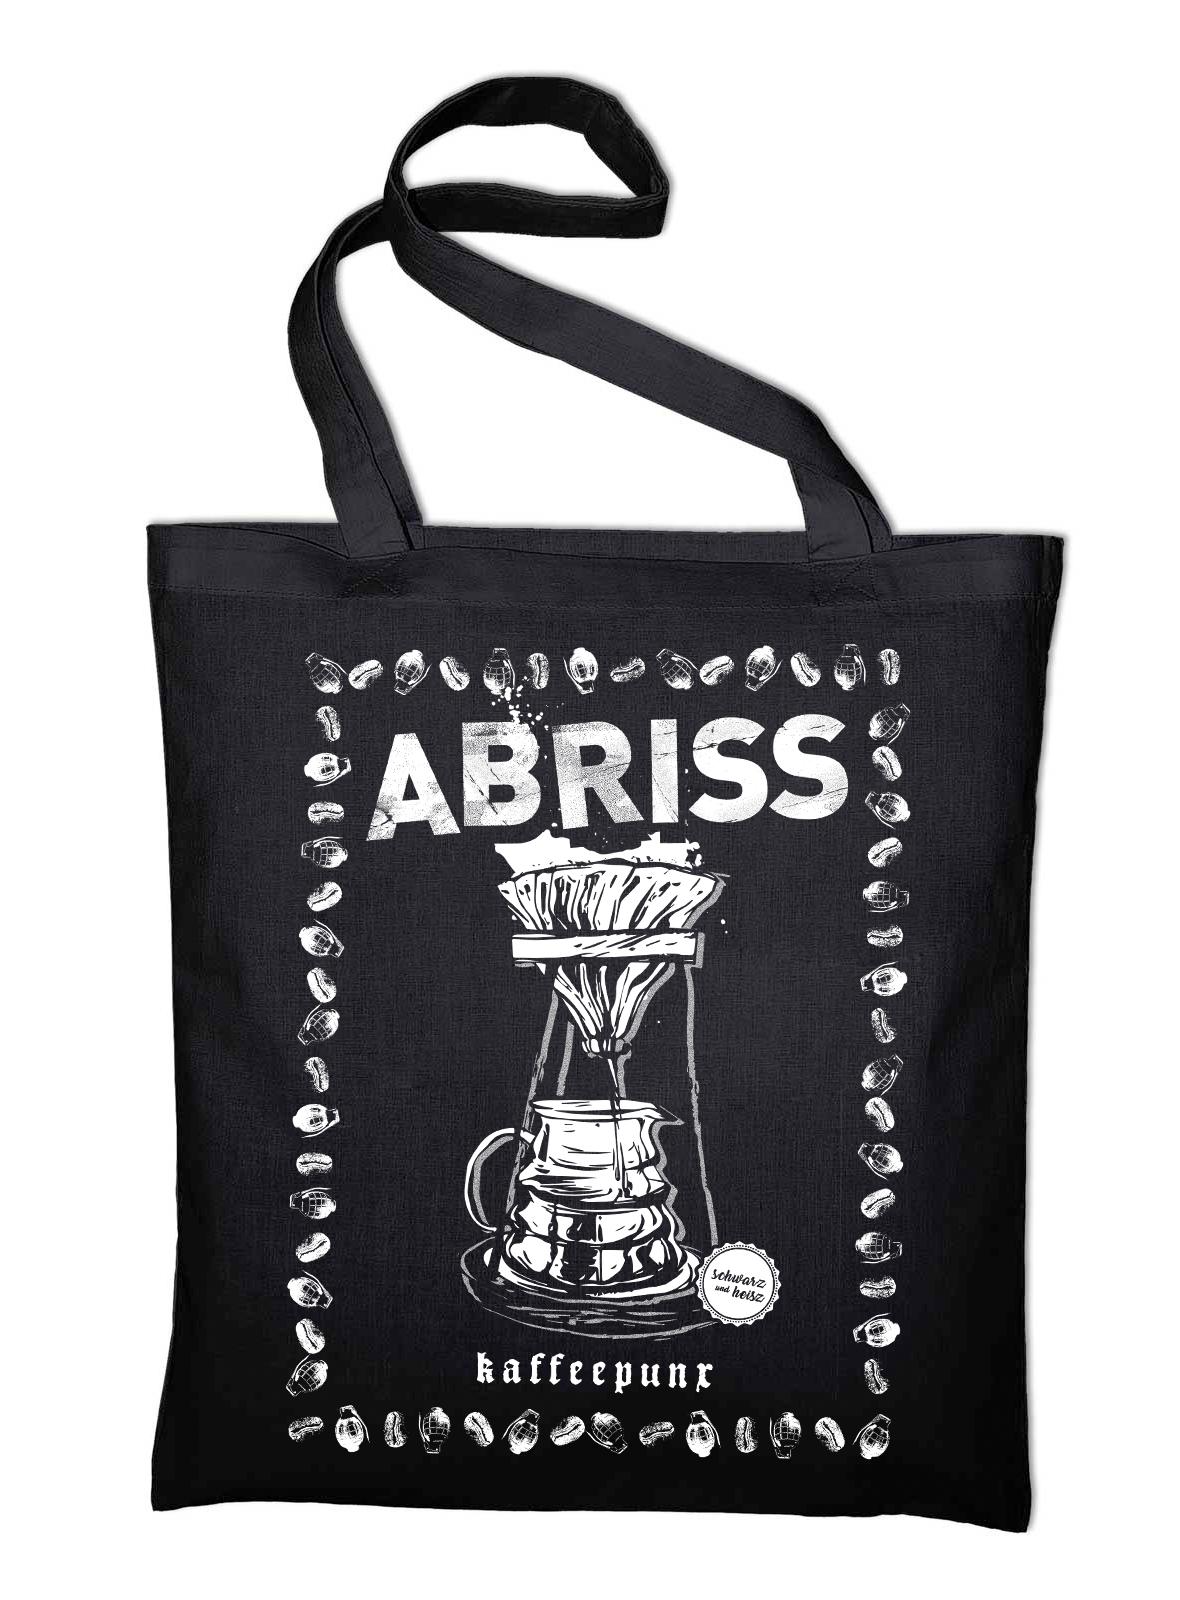 Abriss - Kaffeepunx Beutel